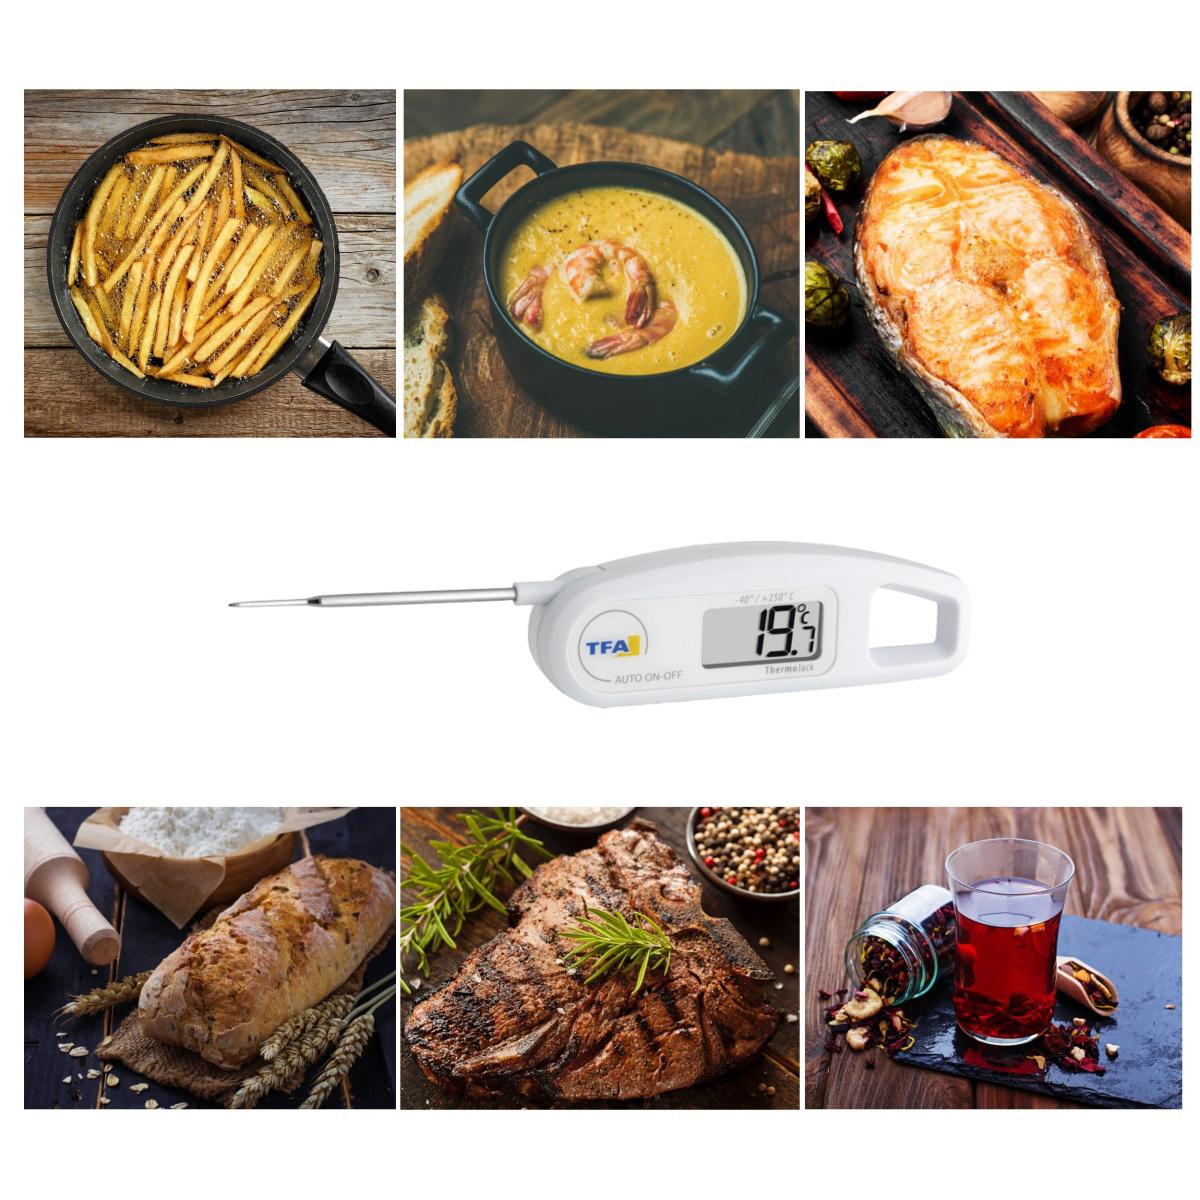 30-1047-02-digitales-einstich-thermometer-thermo-jack-anwendung-1200x1200px.jpg